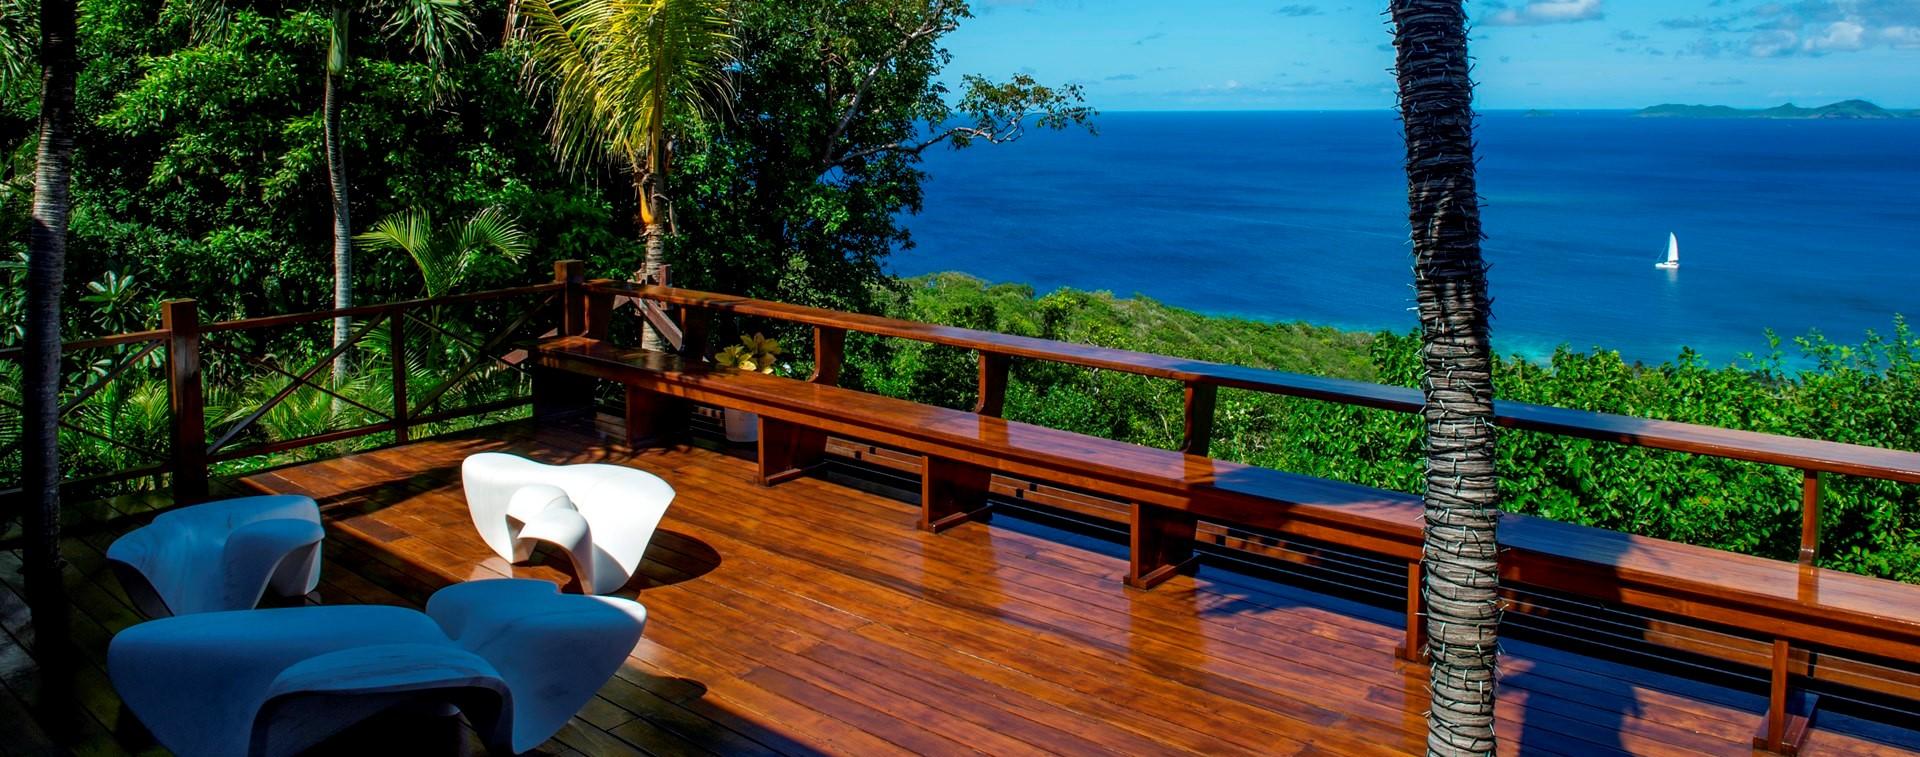 ocean-breeze-villa-mustique-seaview-deck